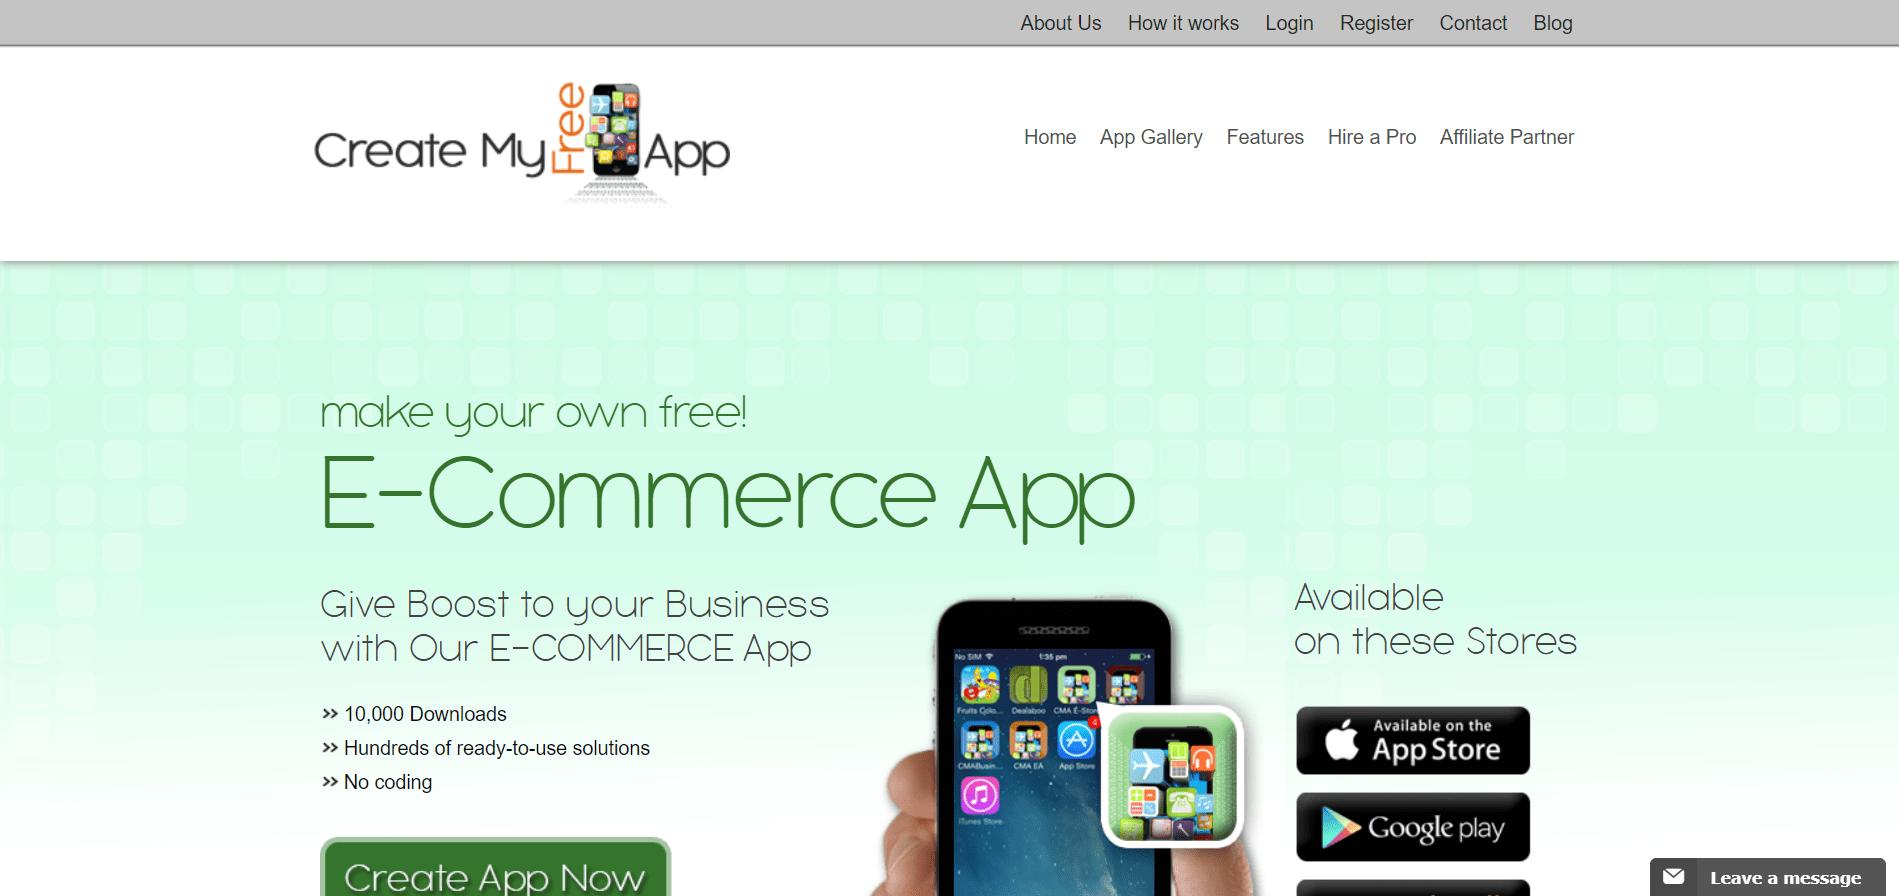 Create My Free App